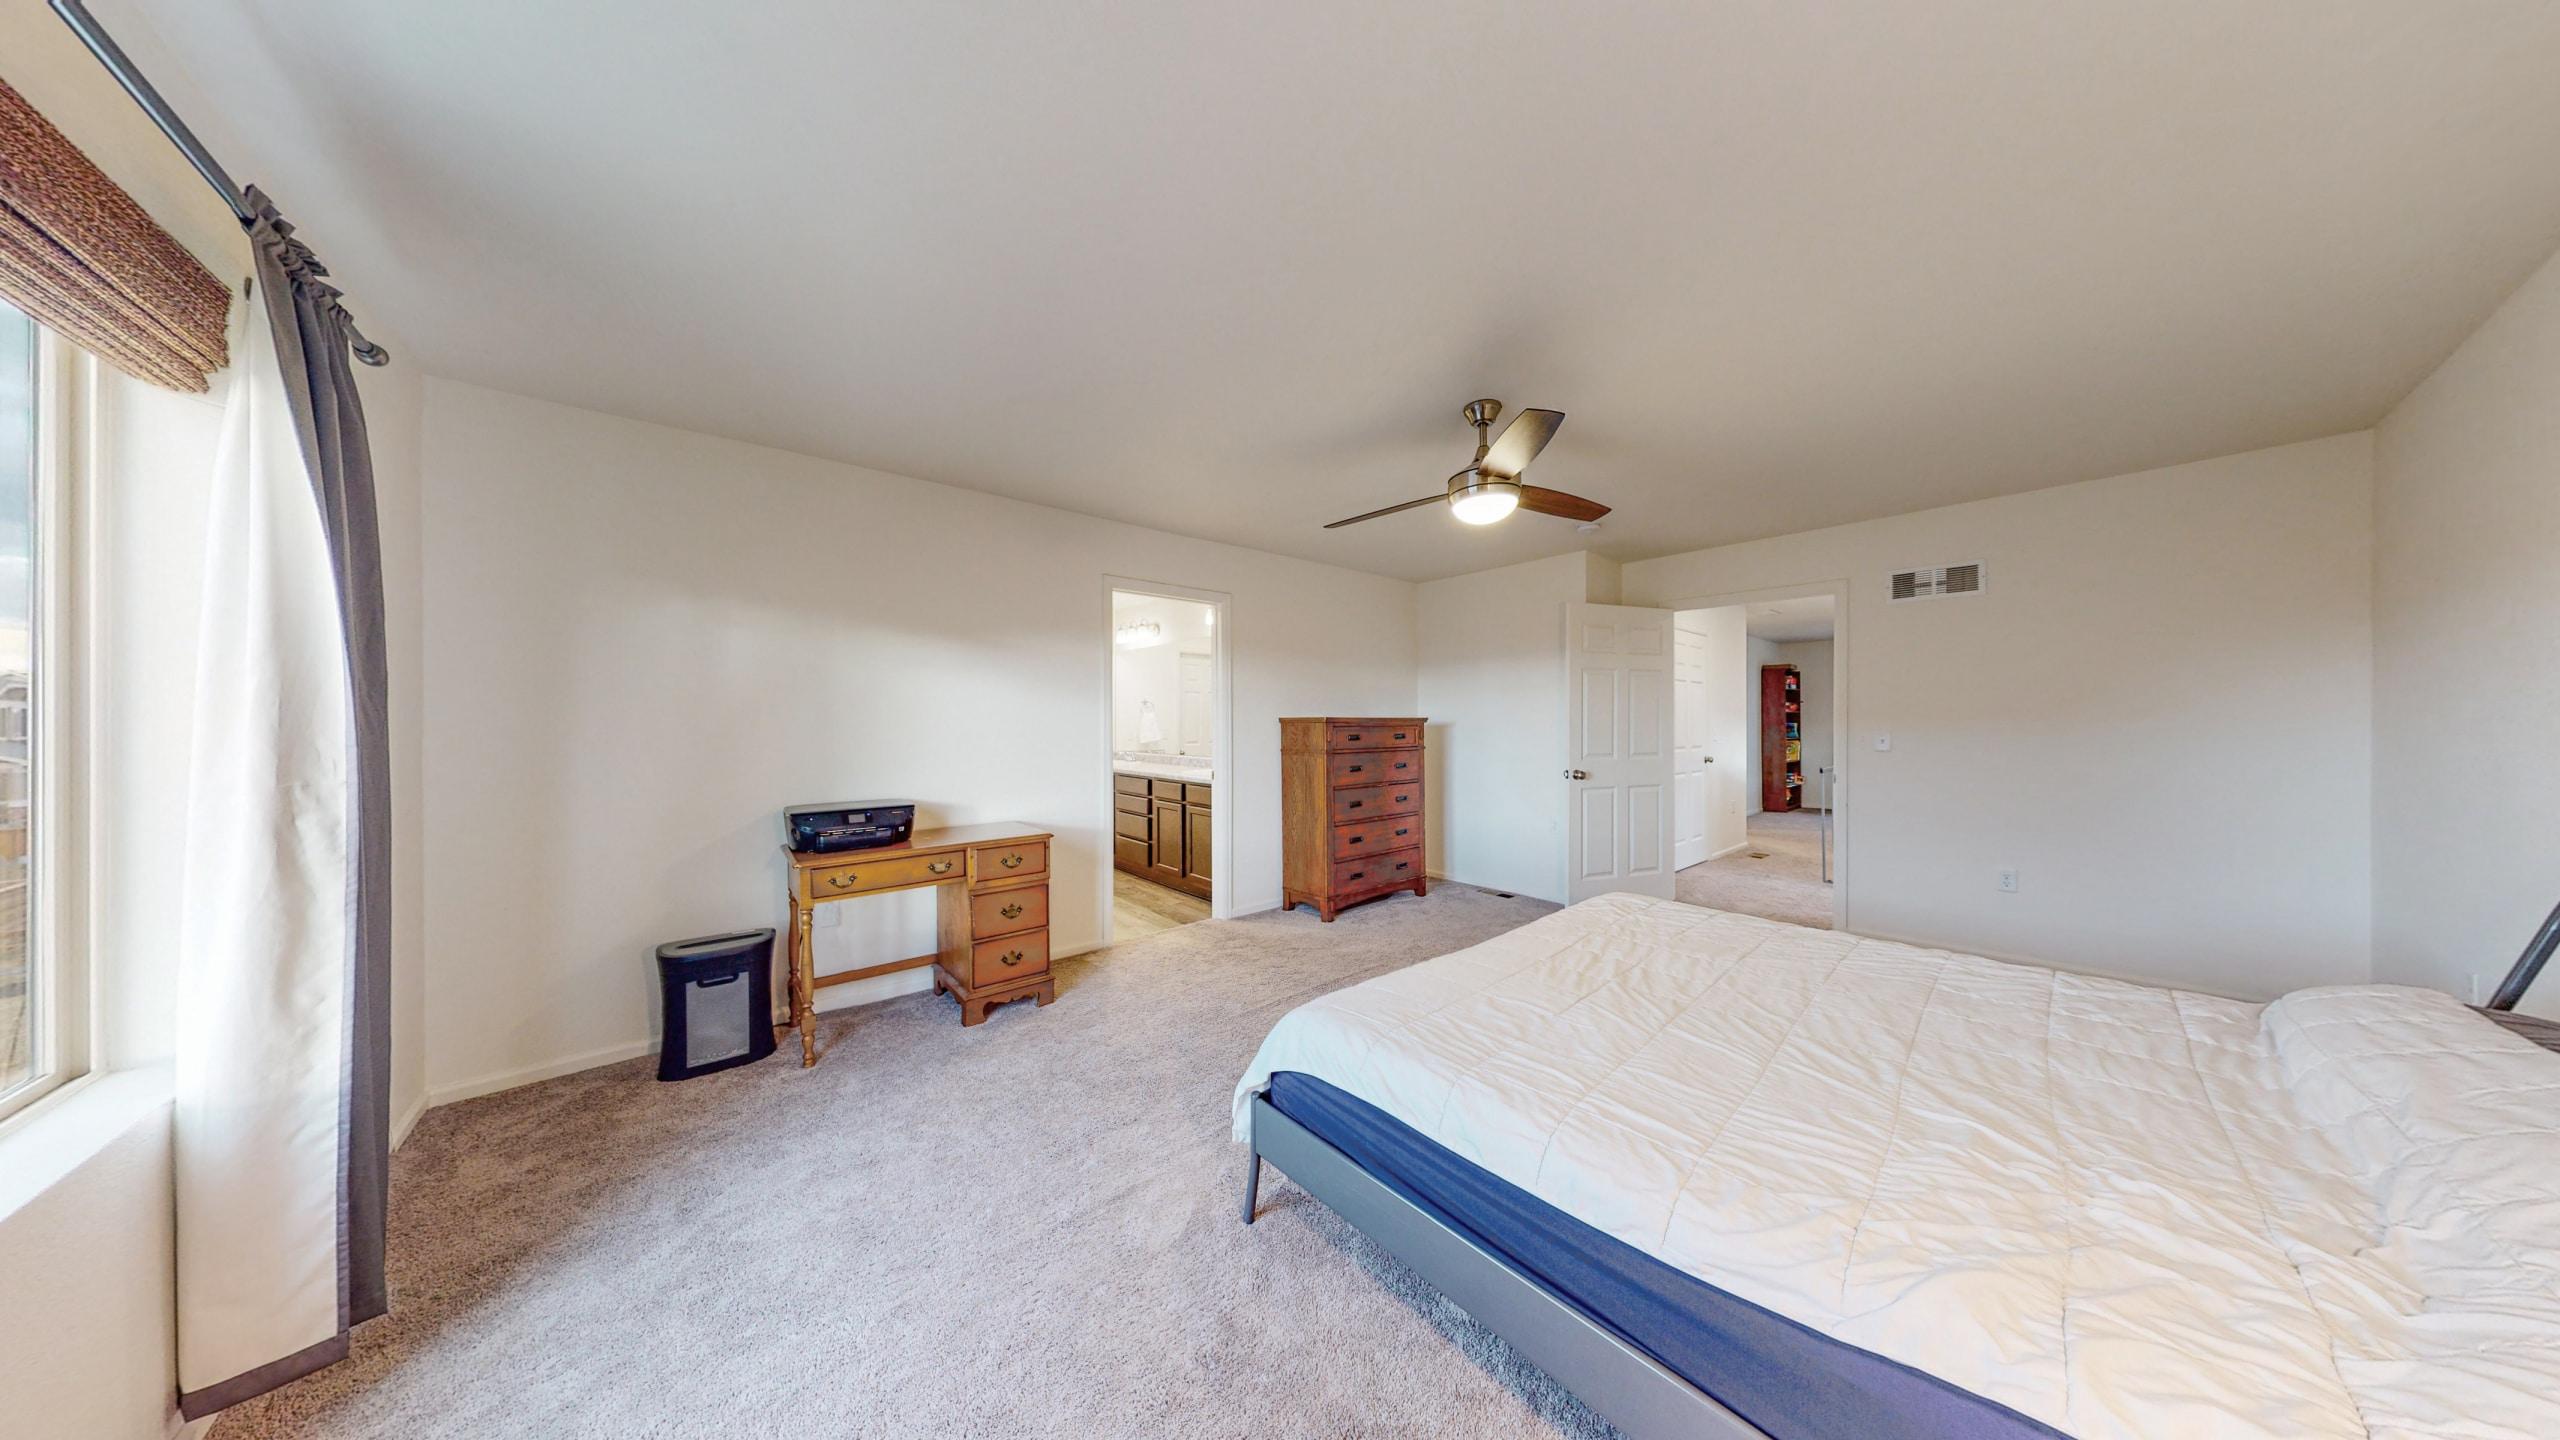 Master Bedroom with en suite bathroom and large walk-in closet